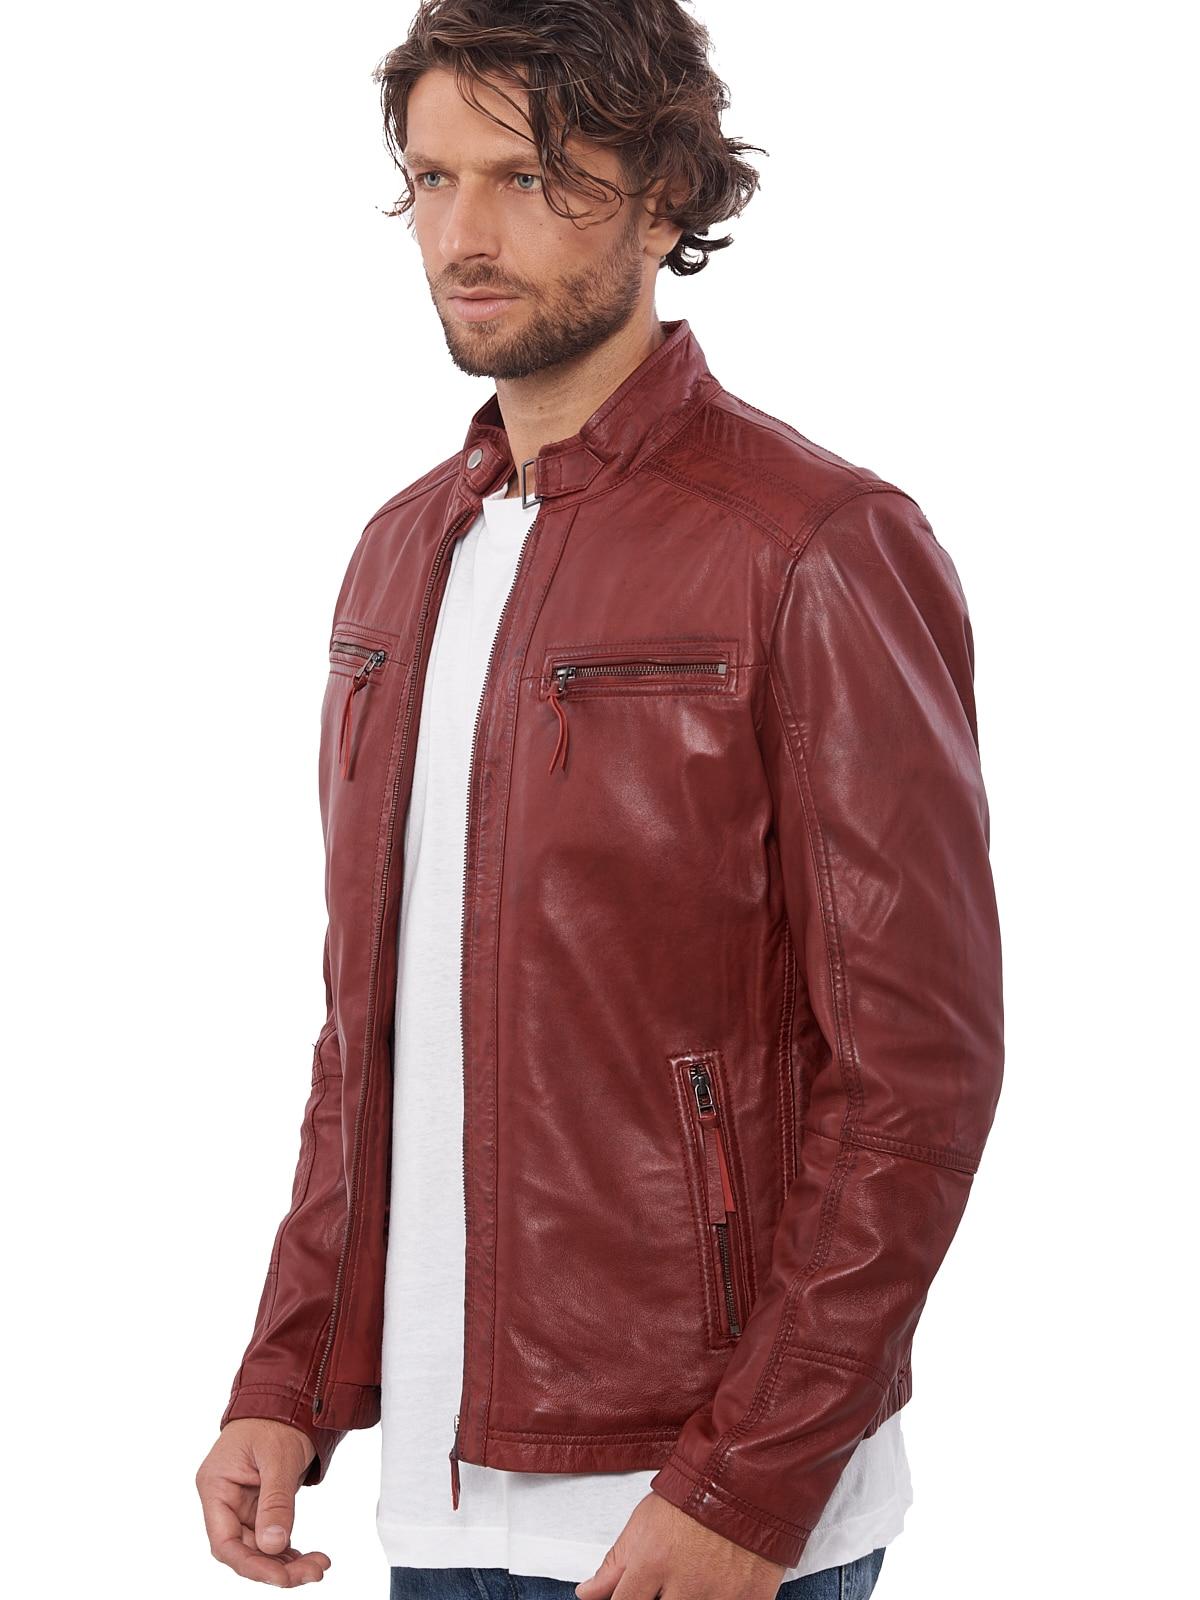 H5502005e45ed414db39bc3028b4ceb03T VAINAS European Brand Mens Genuine Leather jacket for men Winter Real sheep leather jacket Motorcycle jackets Biker jackets Alfa